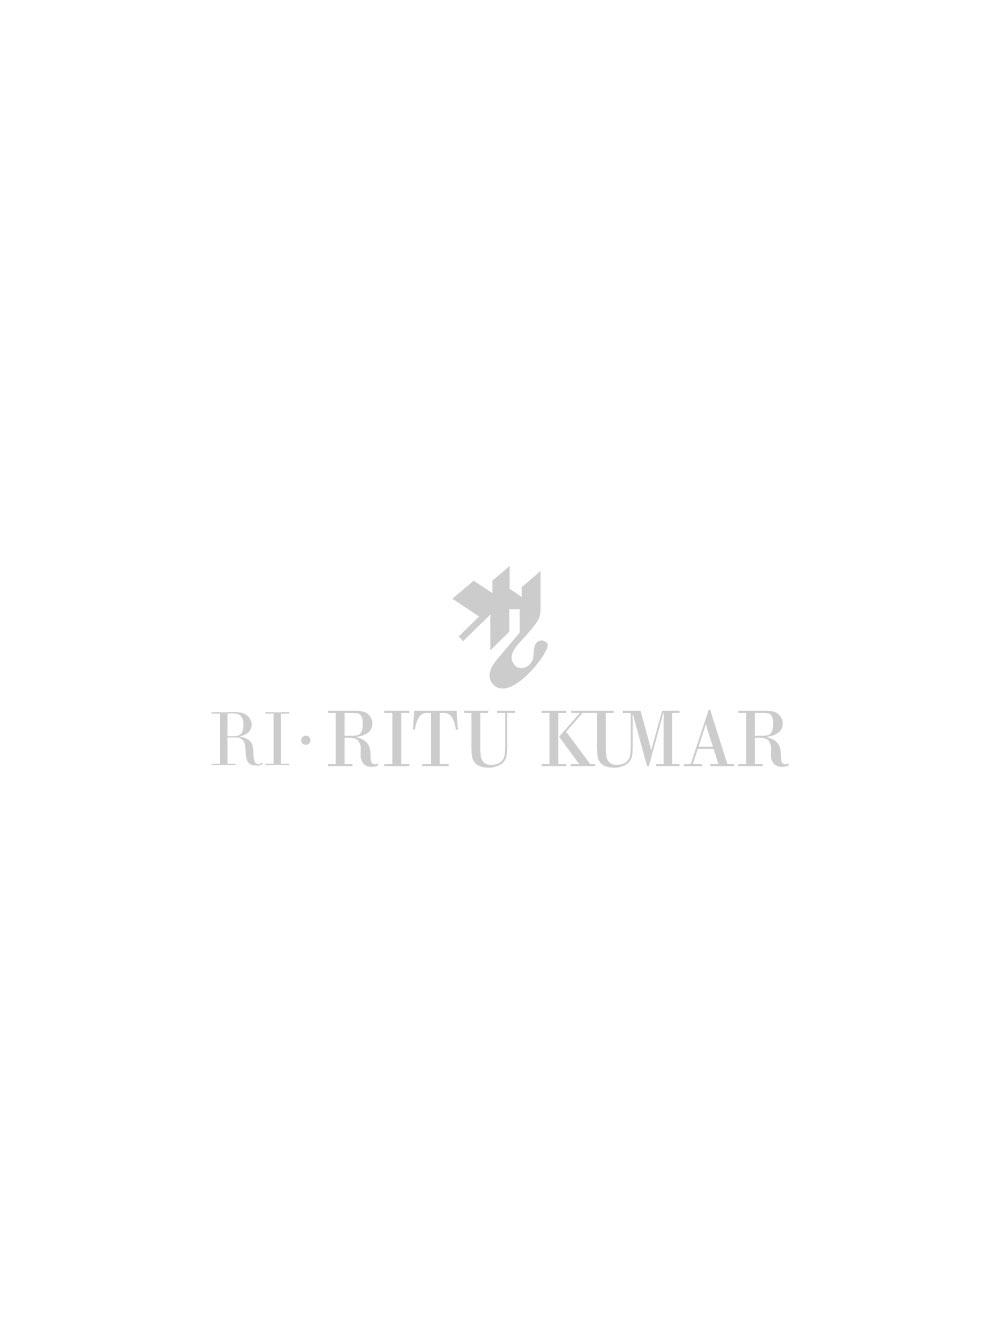 Embroidered Black Cape – Ritu Kumar